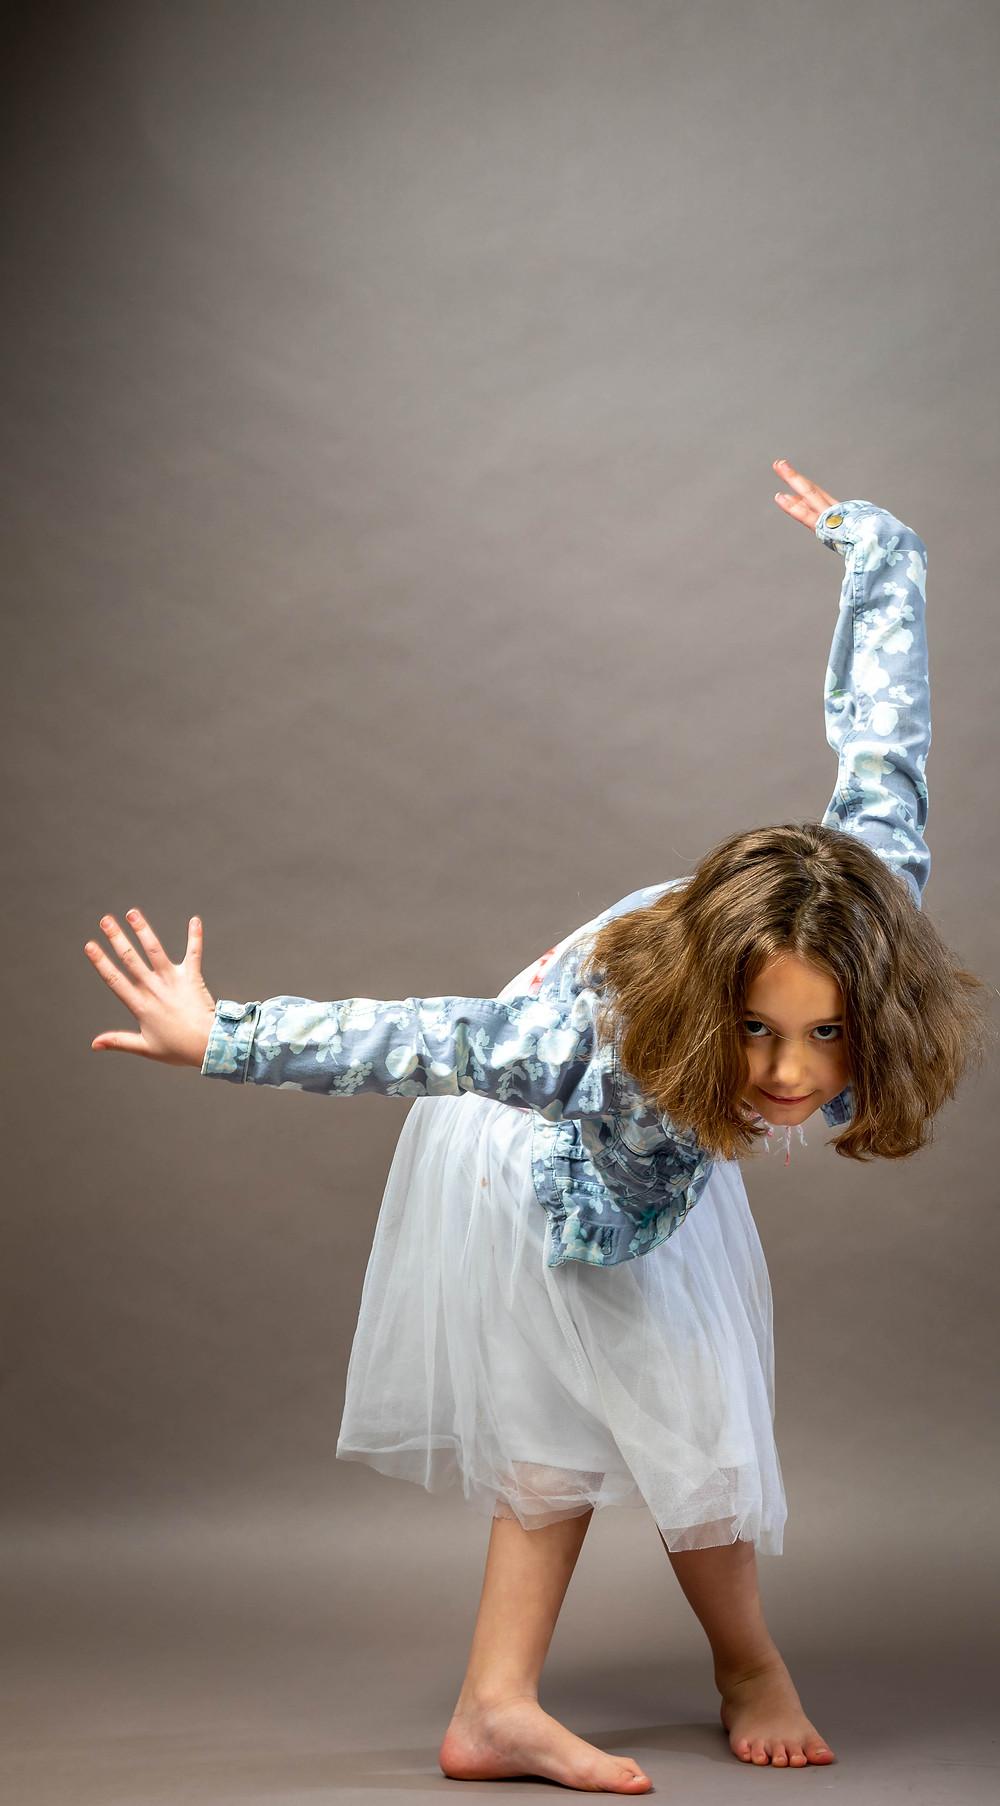 Cincinnati portrait photographer captures girl striking a dancing pose.